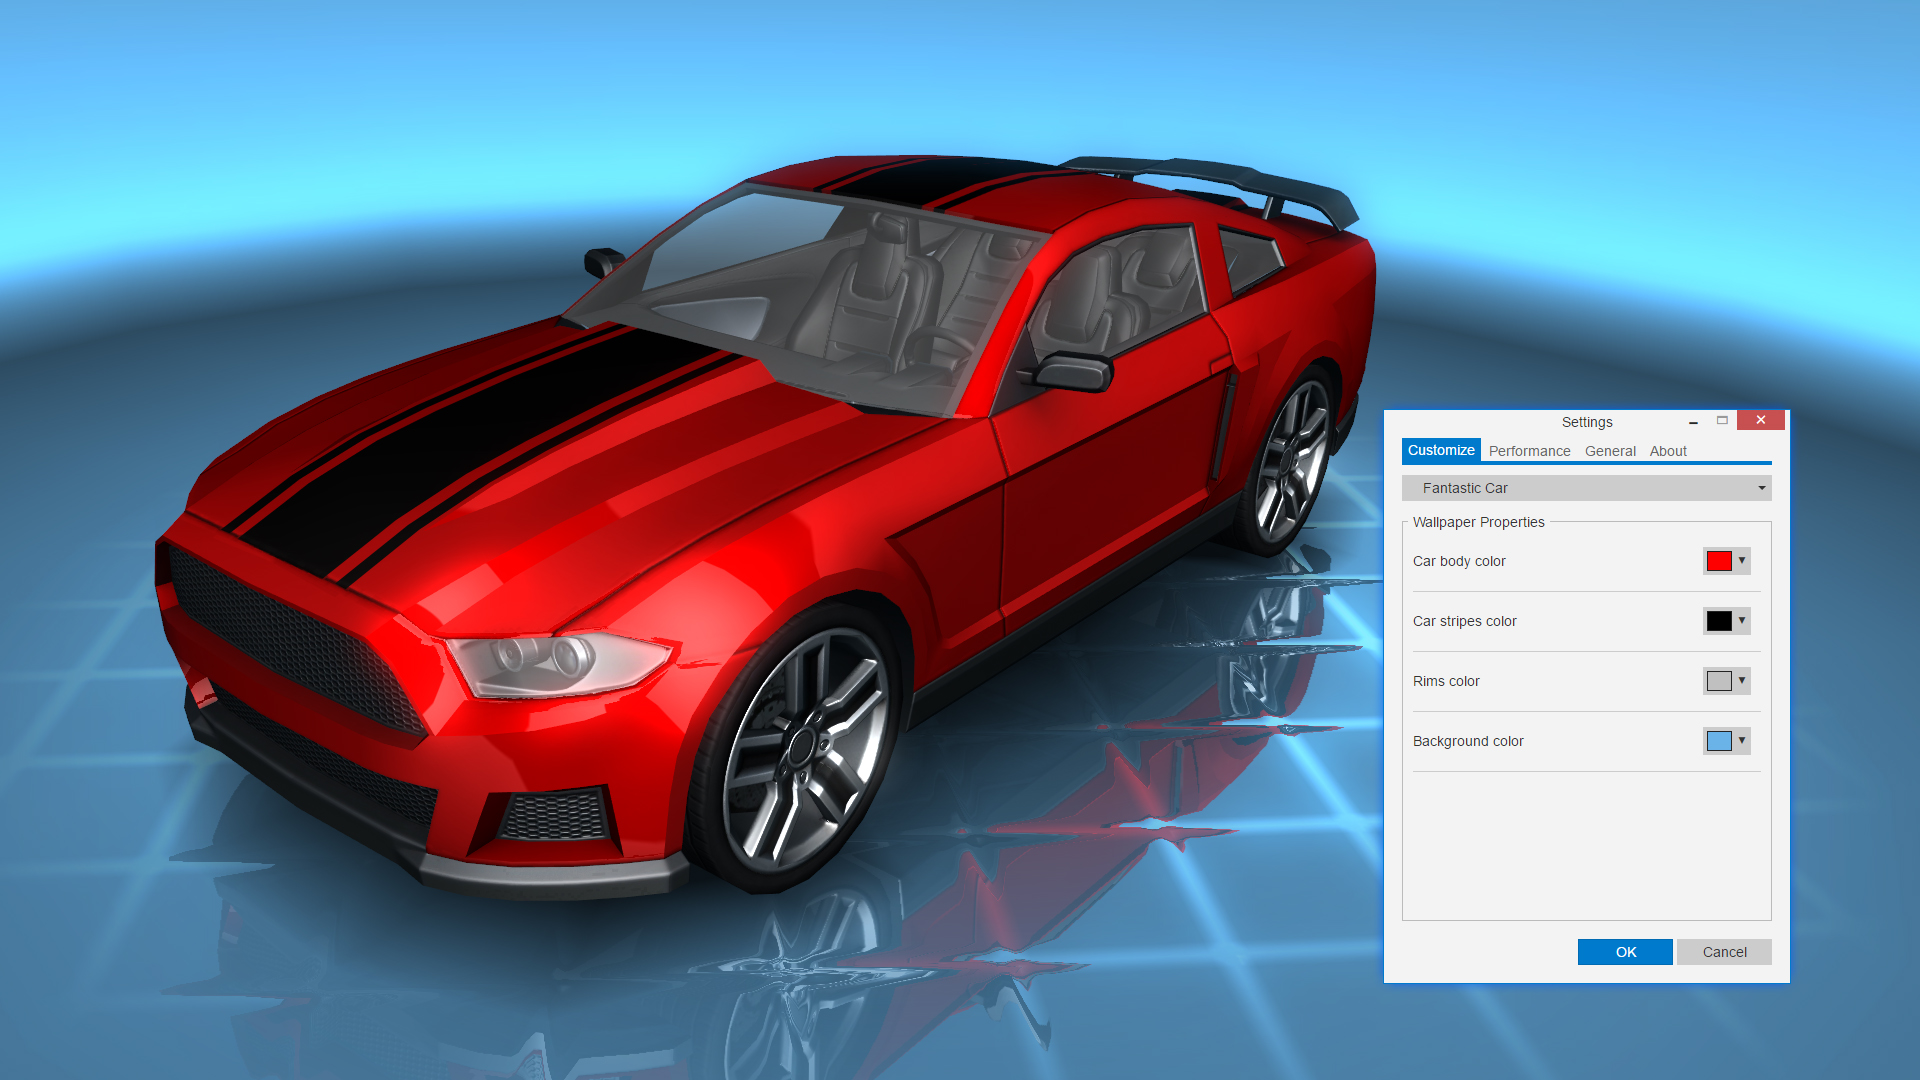 Wallpaper Engine Free Download PC Game Full Version